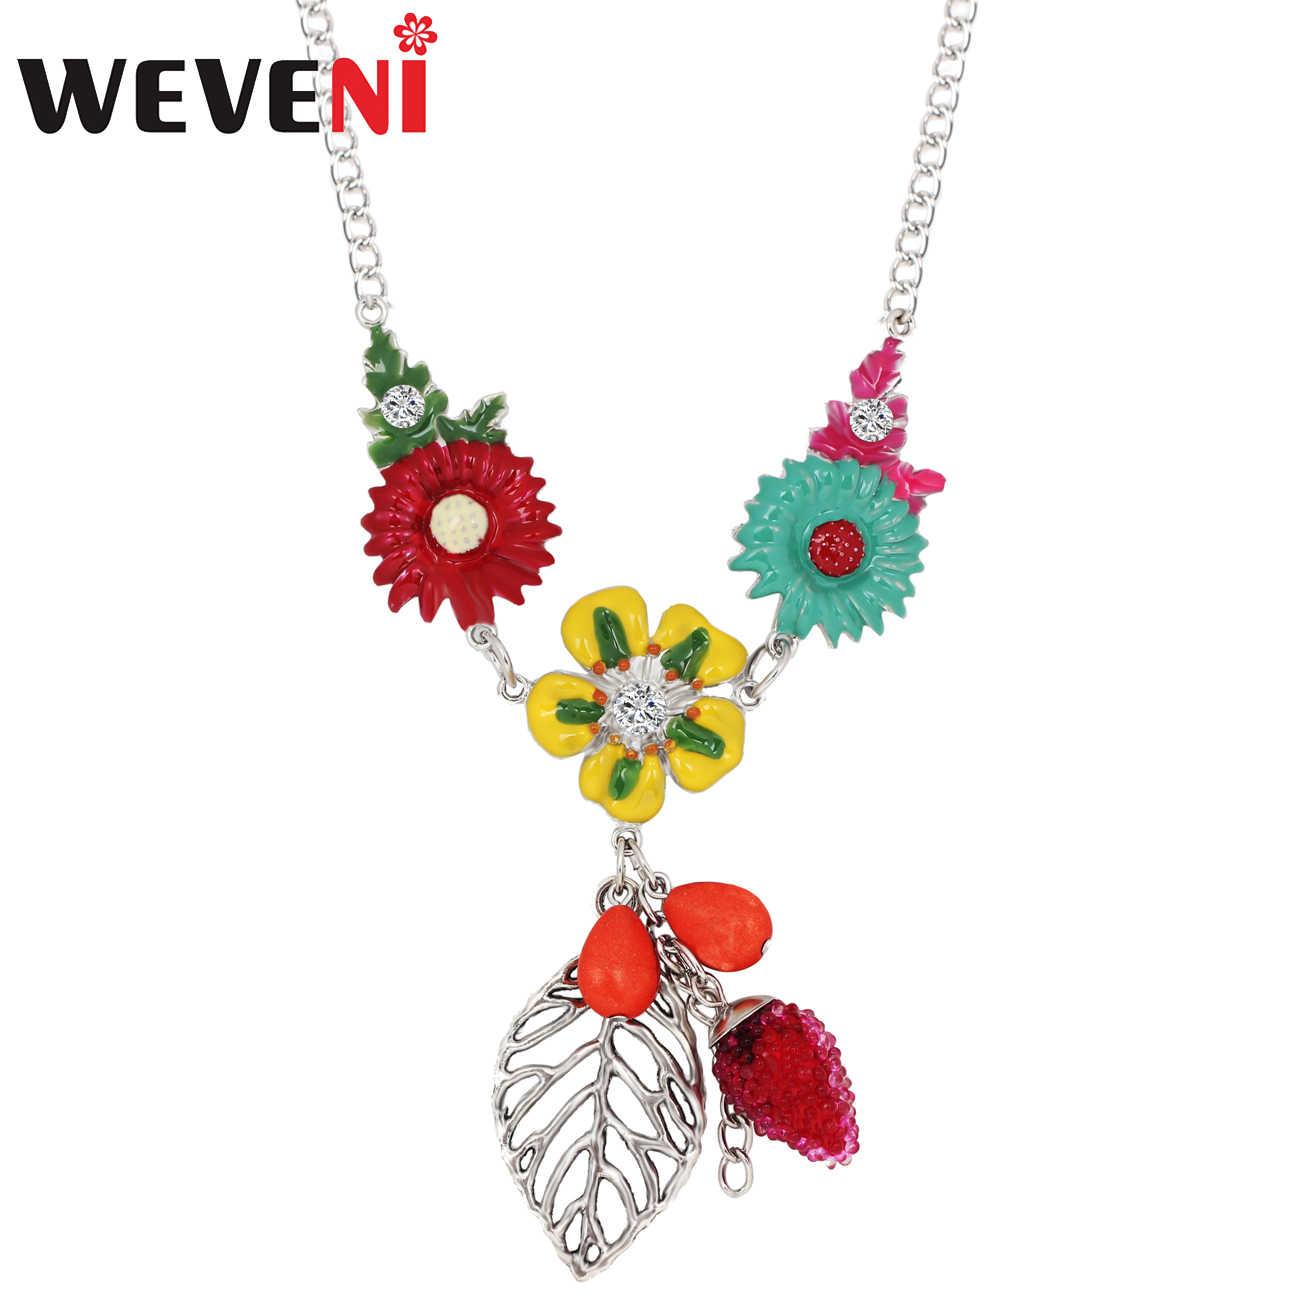 WEVENI Statement Enamel Alloy Silver Flower Leaf Necklace Choker Chain Collier Pendant Boho Vintage Jewelry For Women Girls Gift